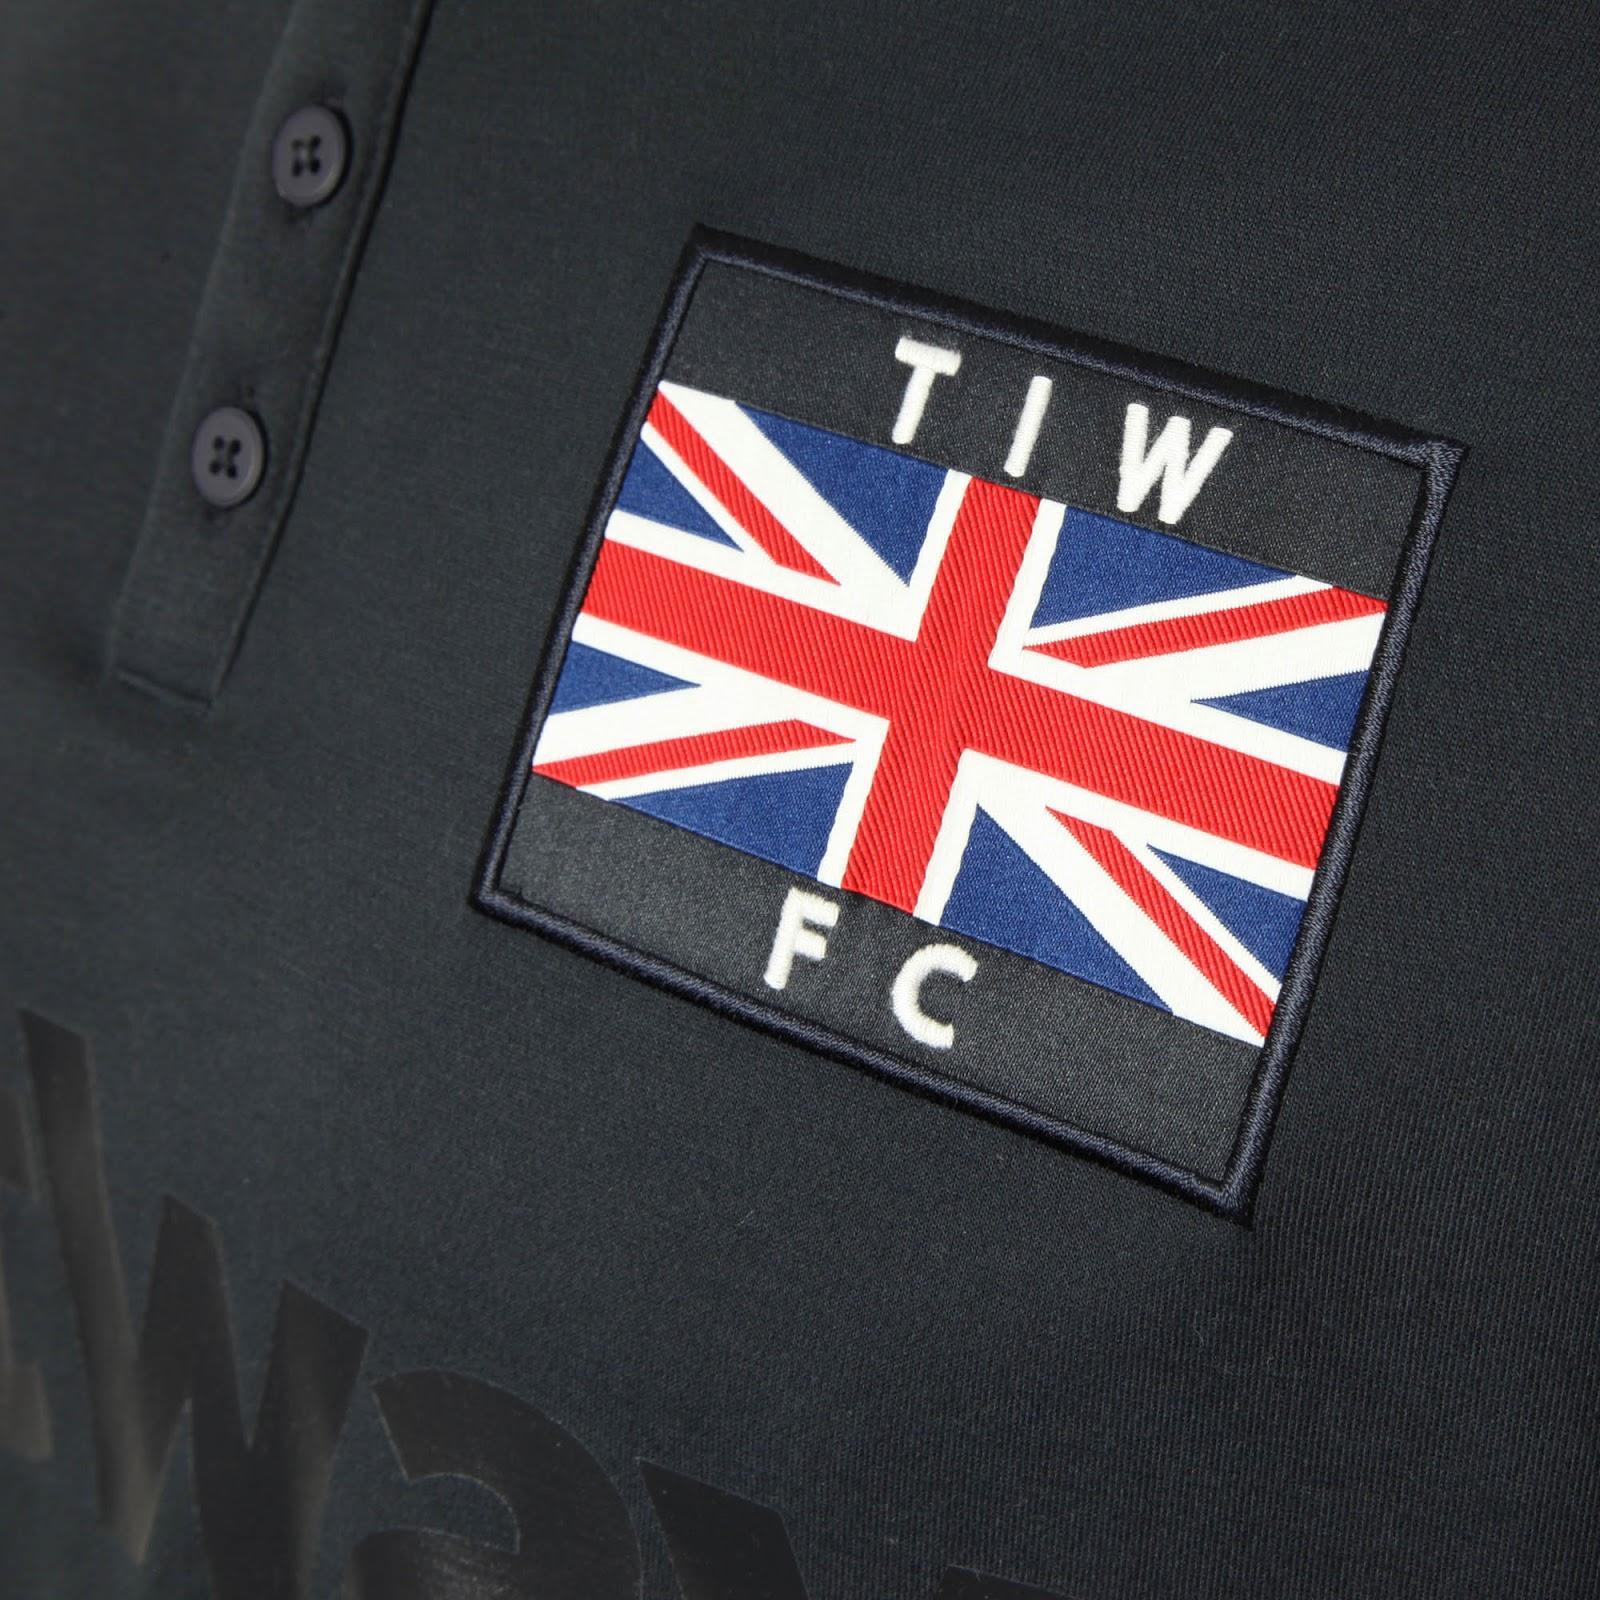 west Ham ironworks kit feature